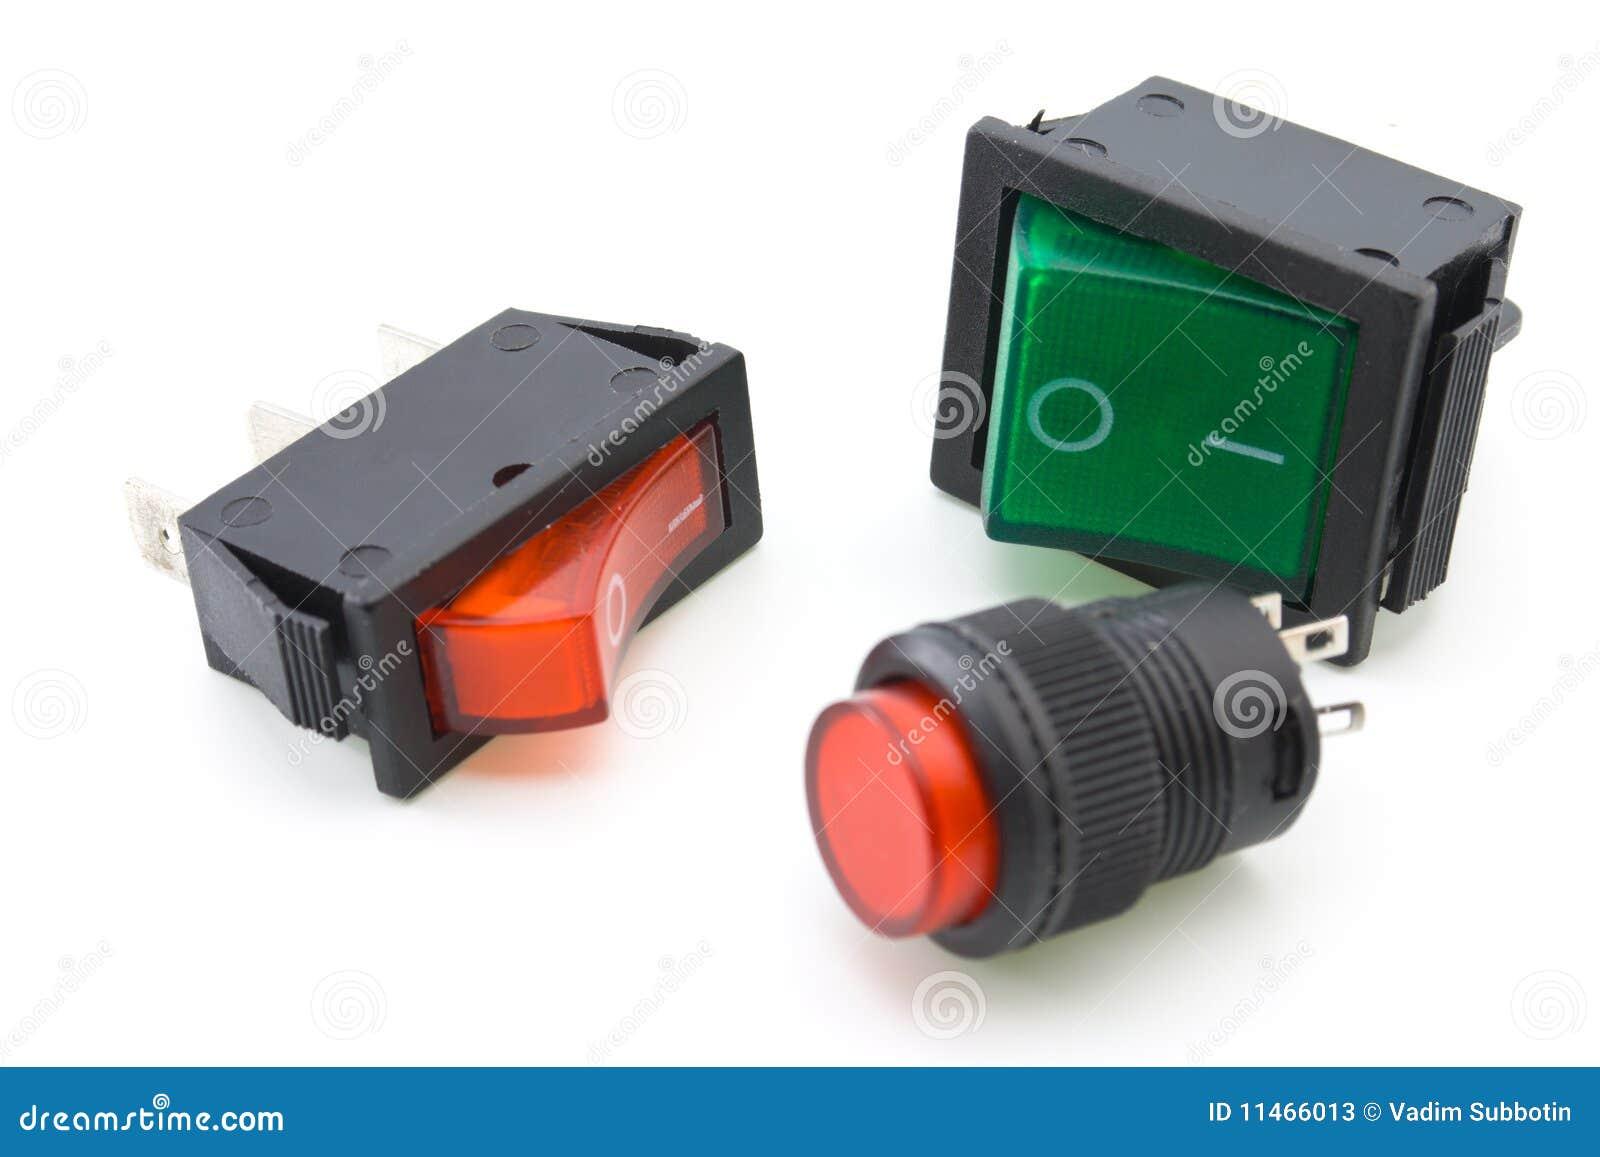 Interruttori elettrici fotografie stock immagine 11466013 - Interruttori elettrici vimar ...